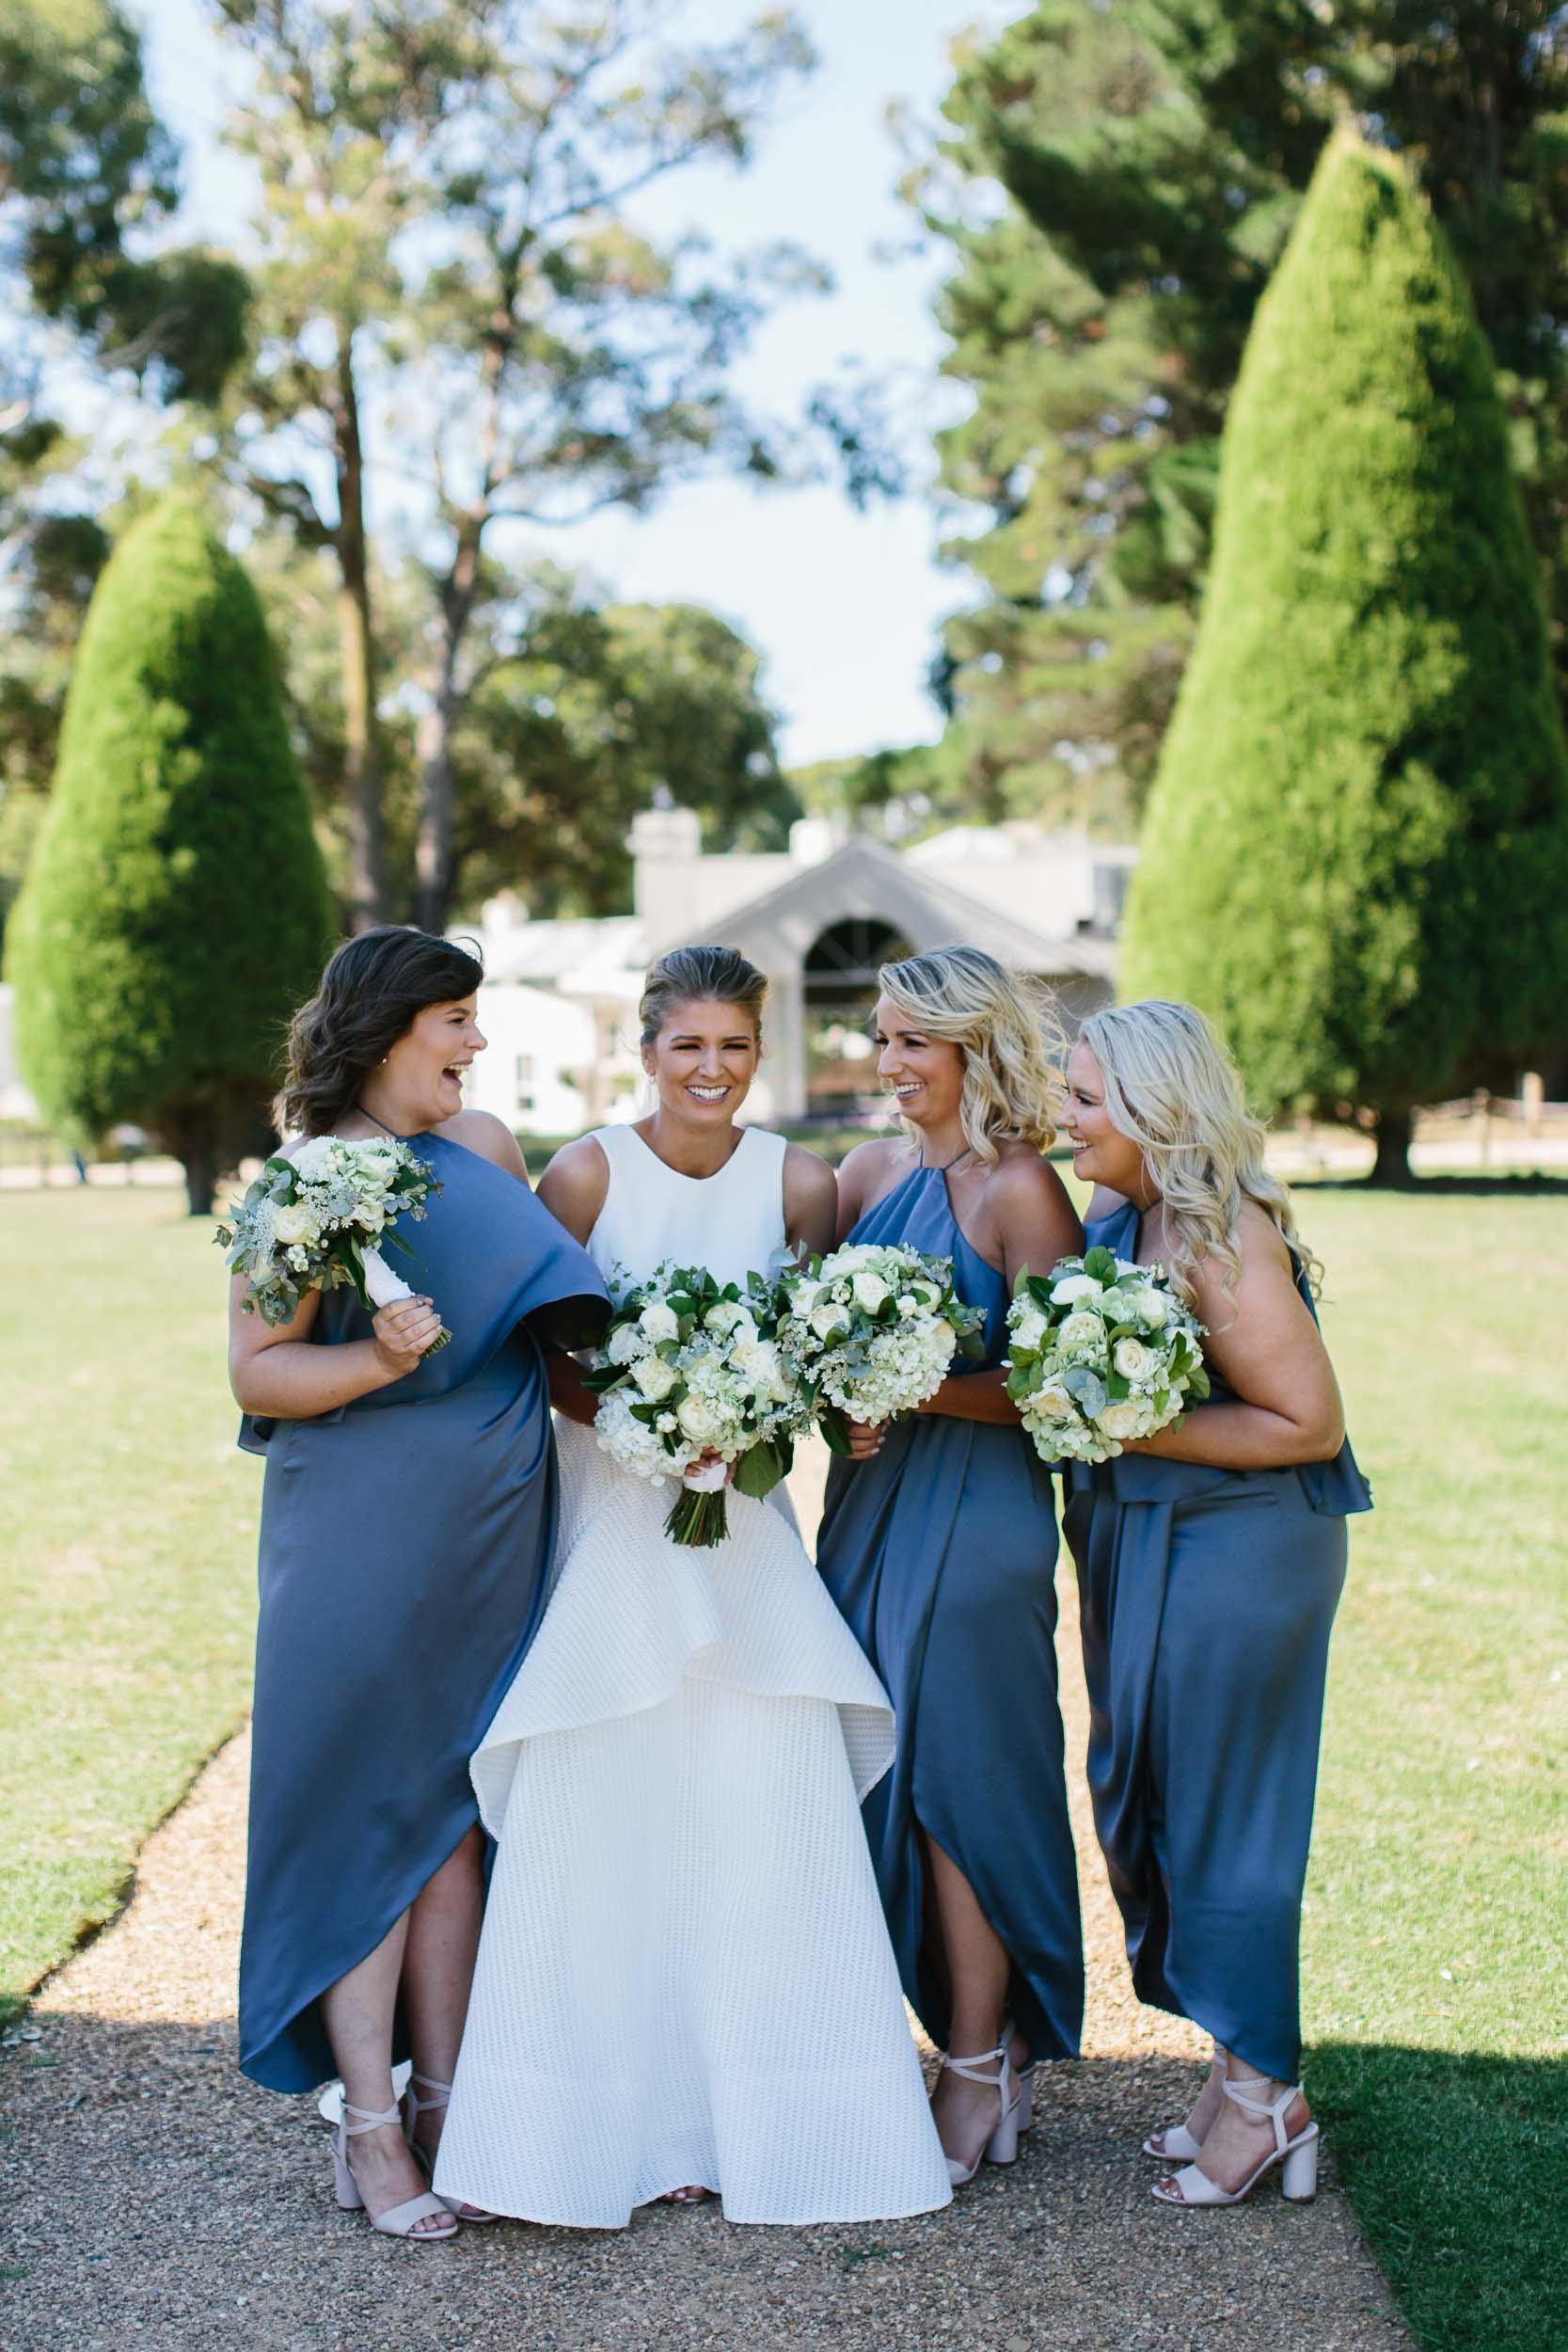 Kas-Richards-Mornington-Peninsula-Wedding-Lindenderry-Red-Hill-387.jpg